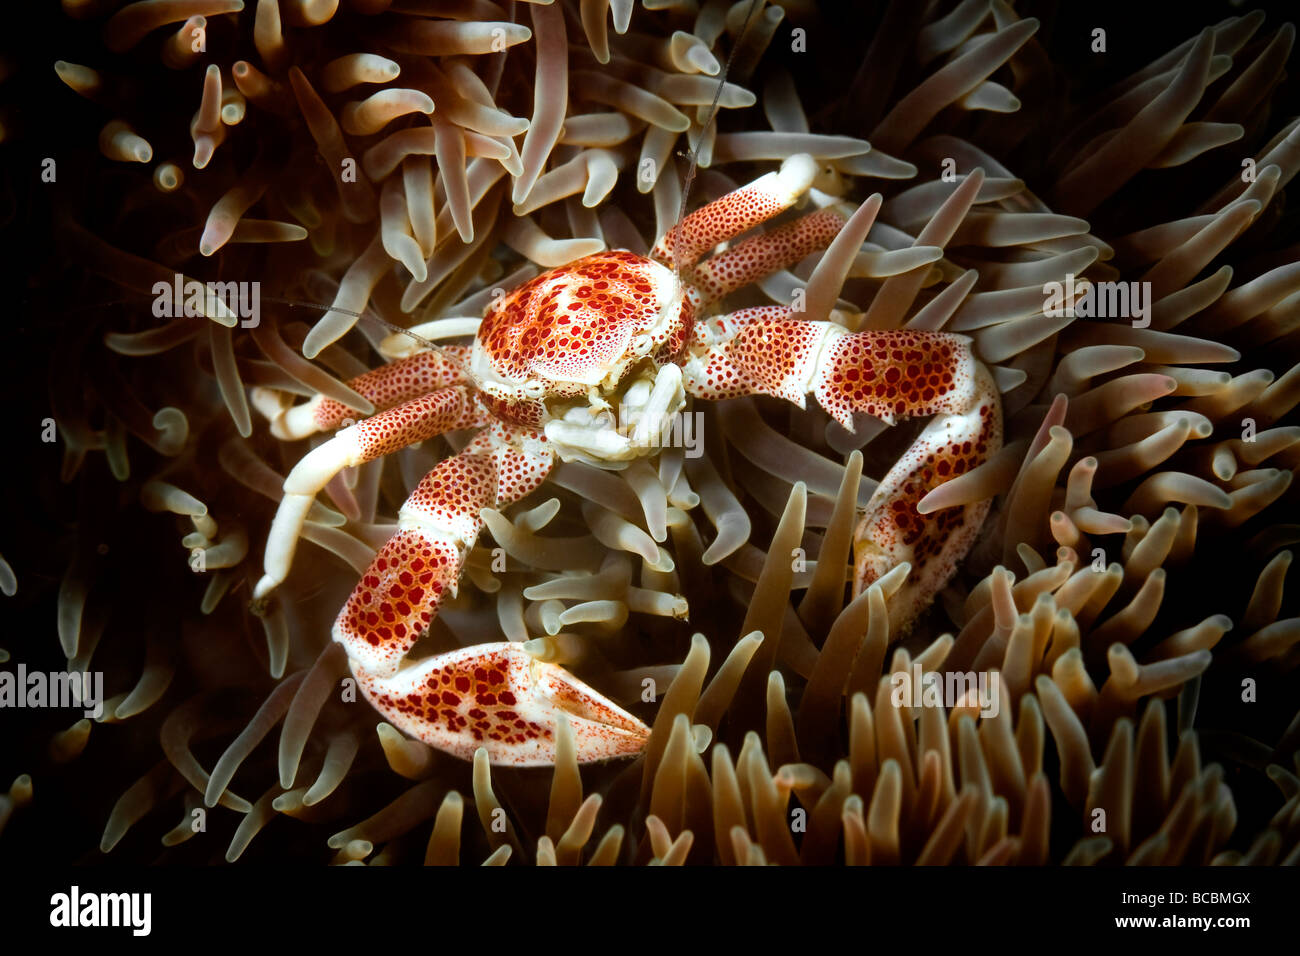 Porcelain crab - Stock Image